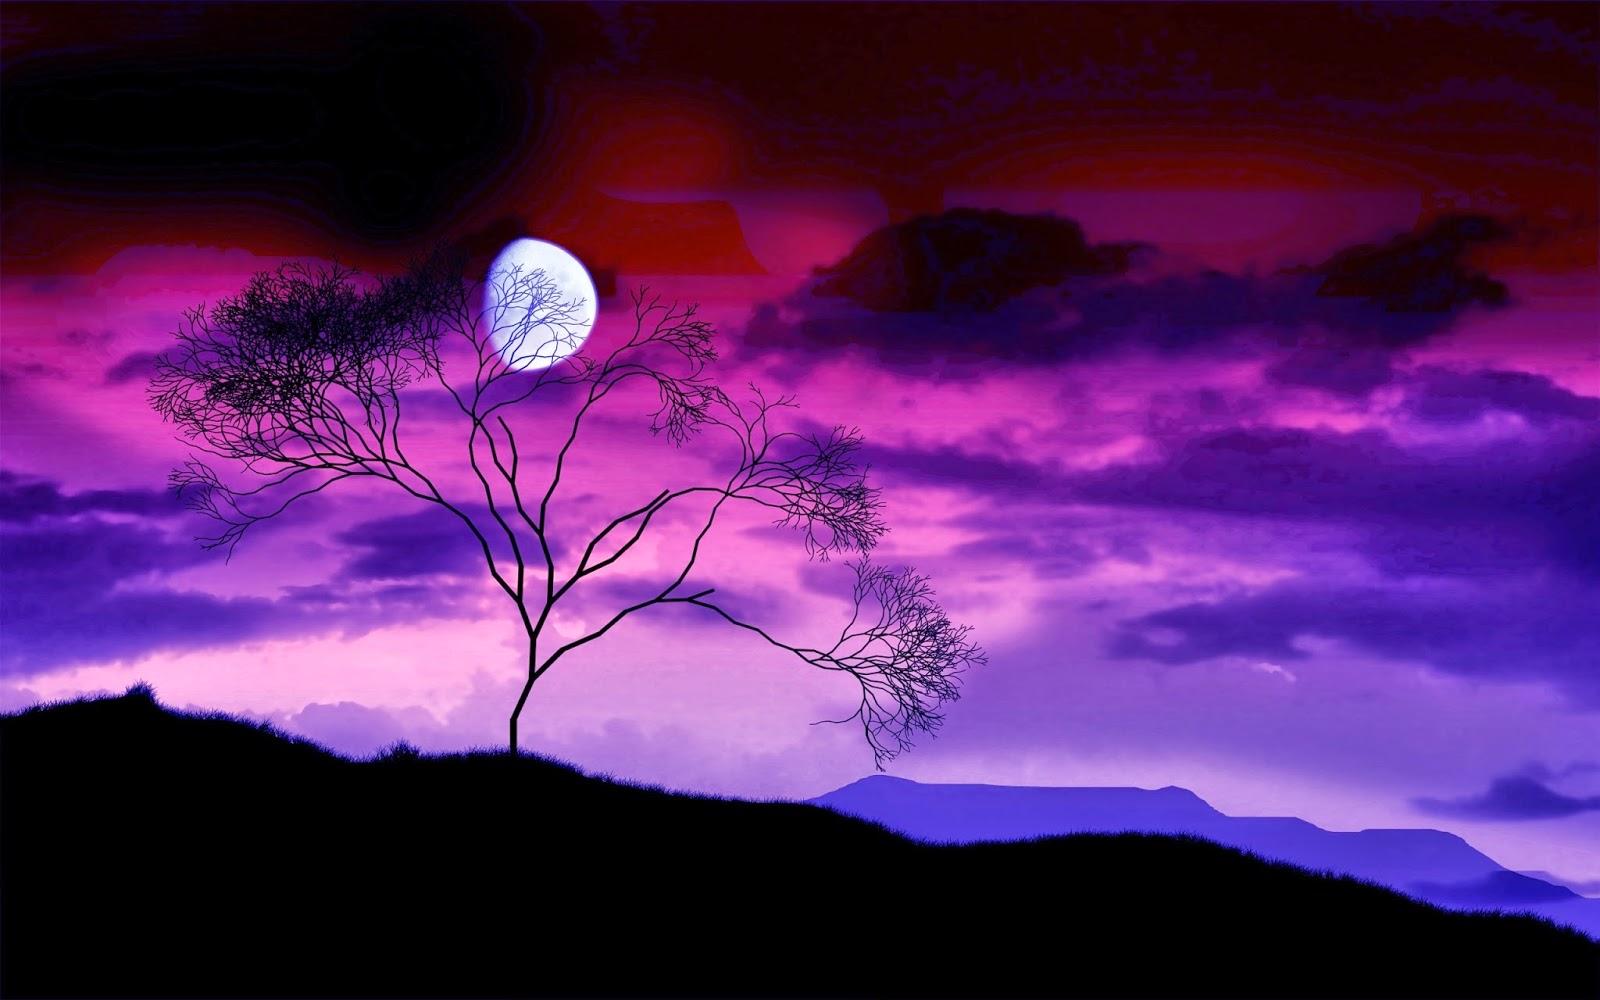 Moon-background-stock-images-for-desktop-free-download.jpg